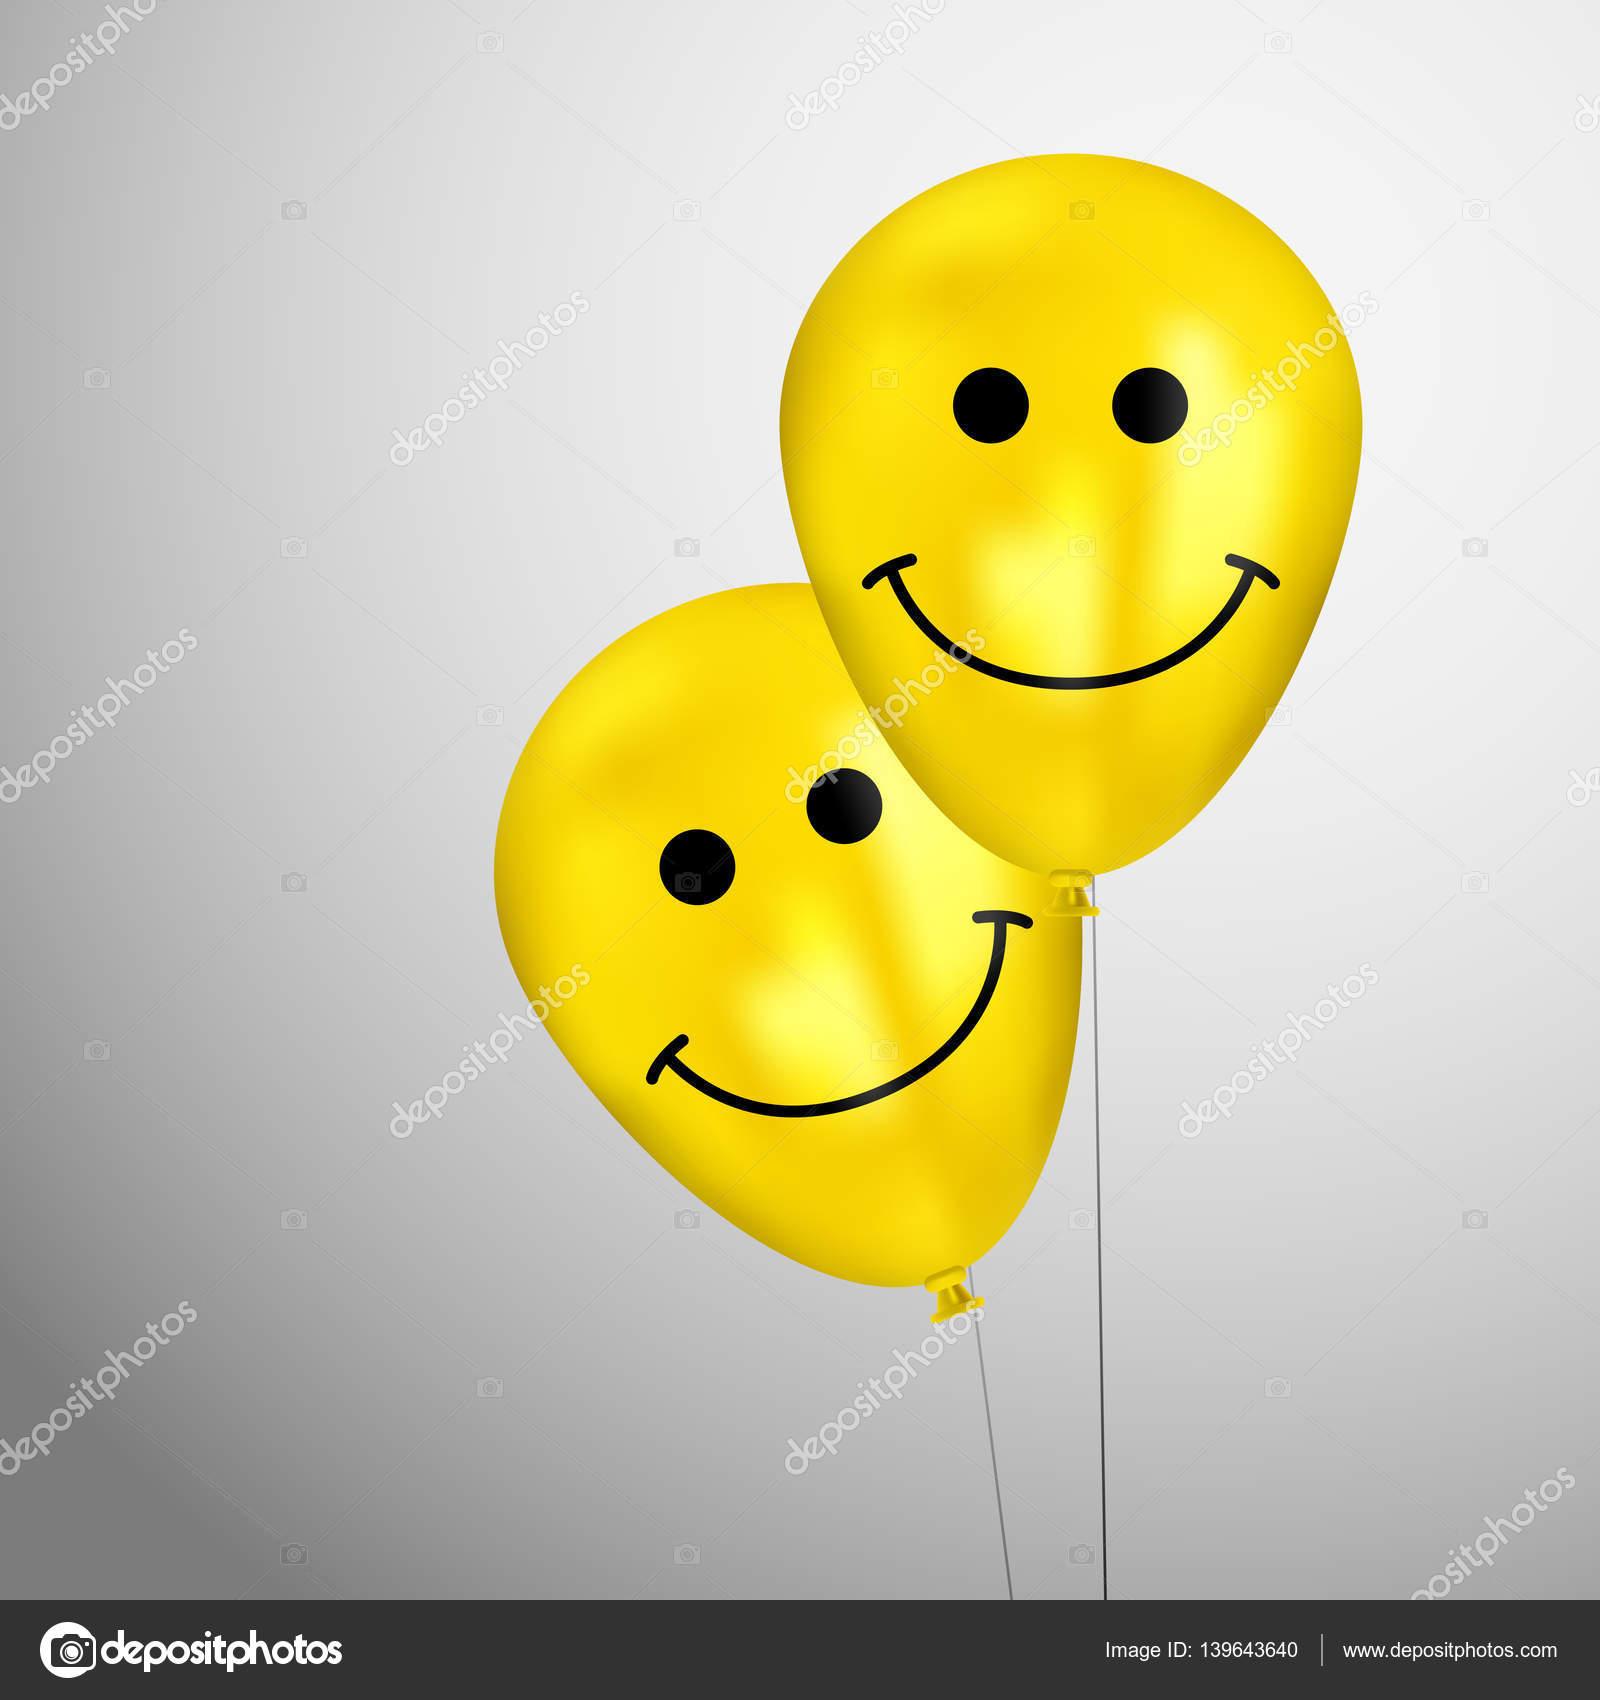 Realistische Gelbe Geburtstag Luftballons Mit Cartoon Smileys